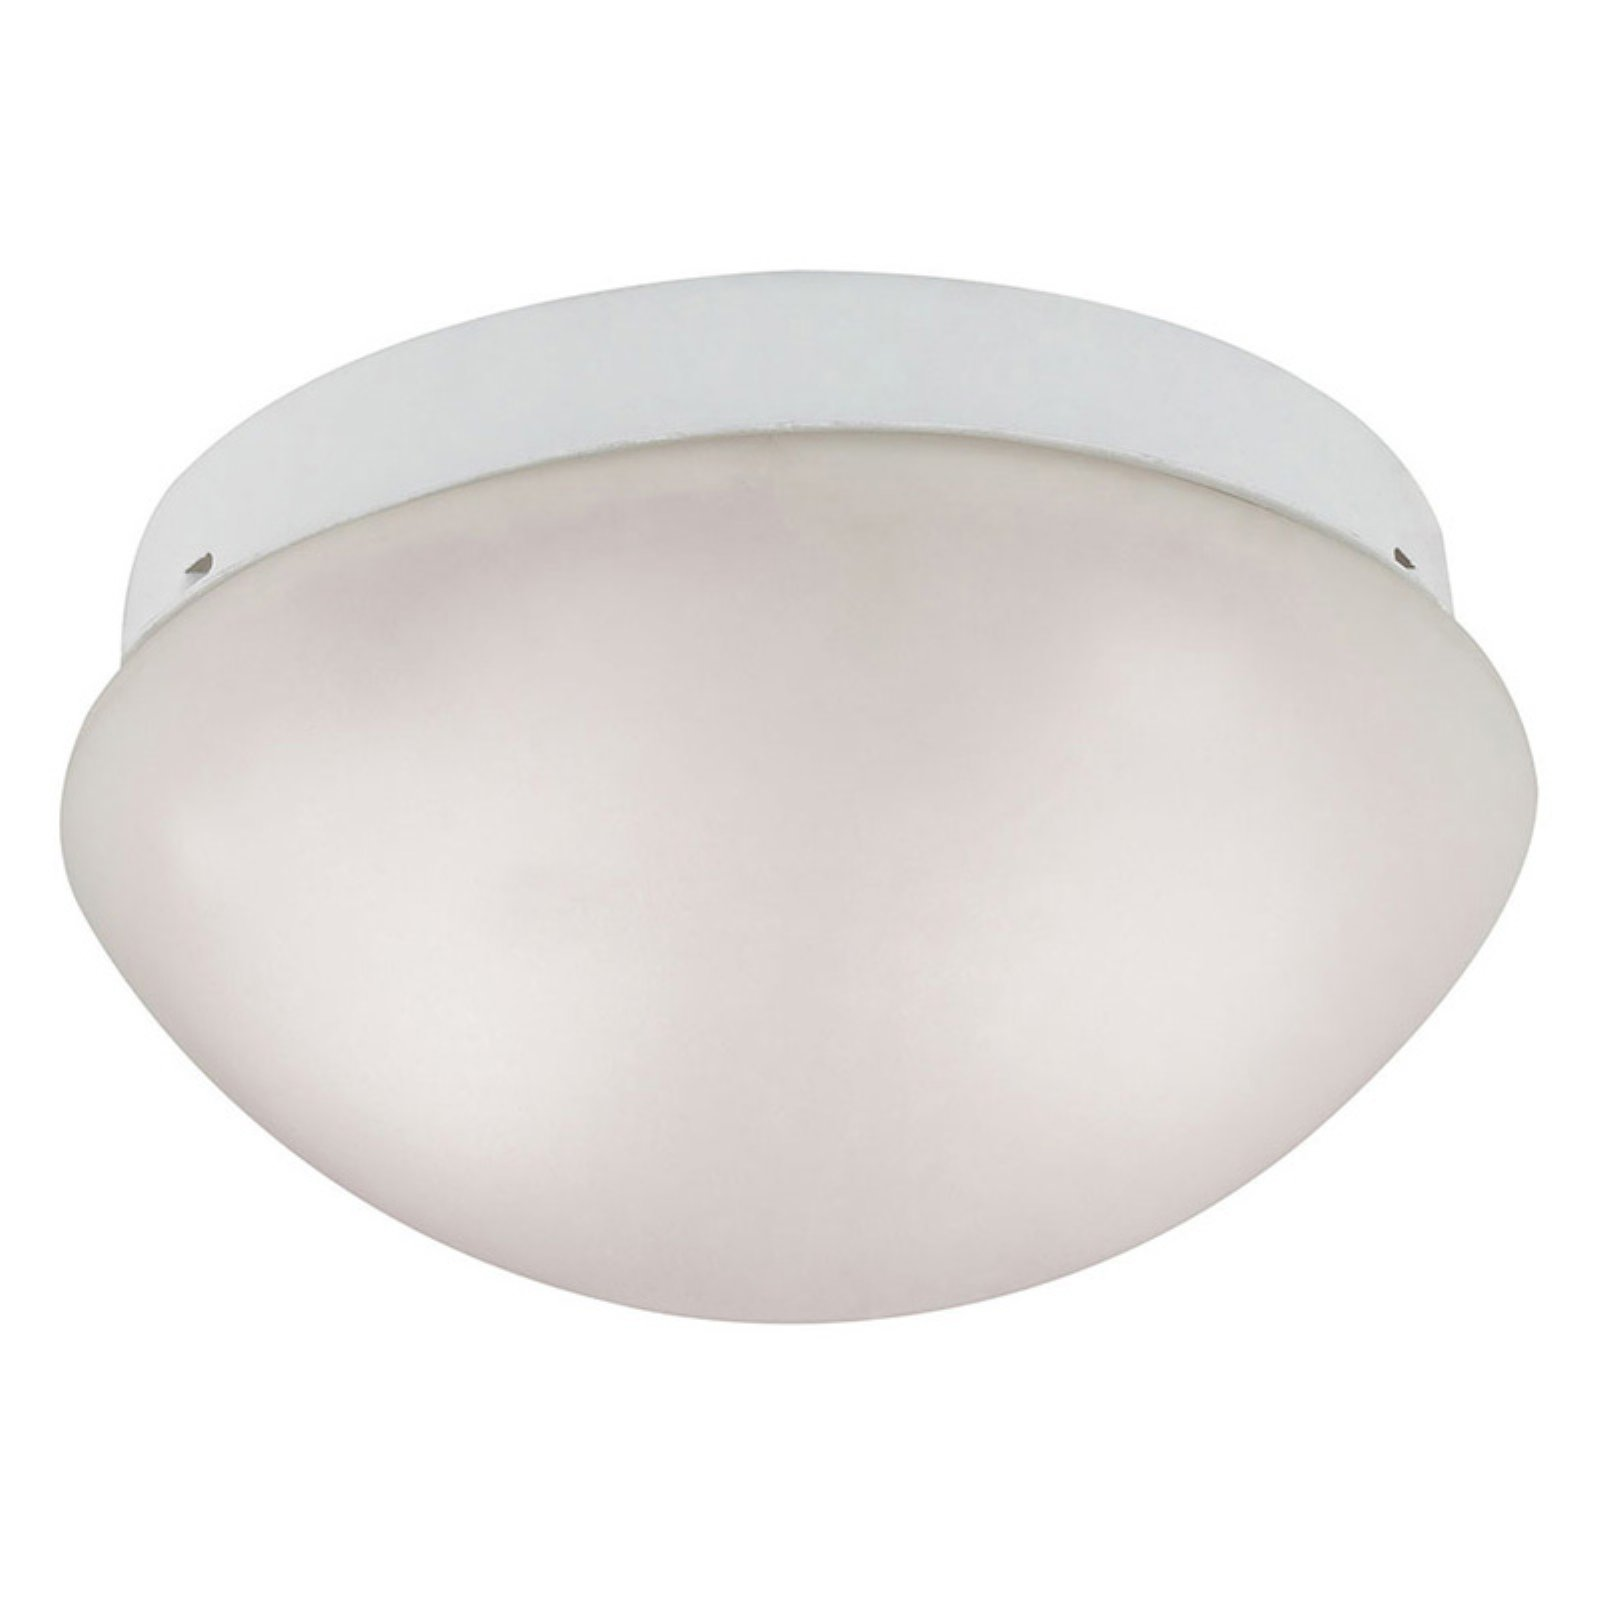 Thomas Lighting 7352 Mushroom Flush Mount Ceiling Light by CornerStone